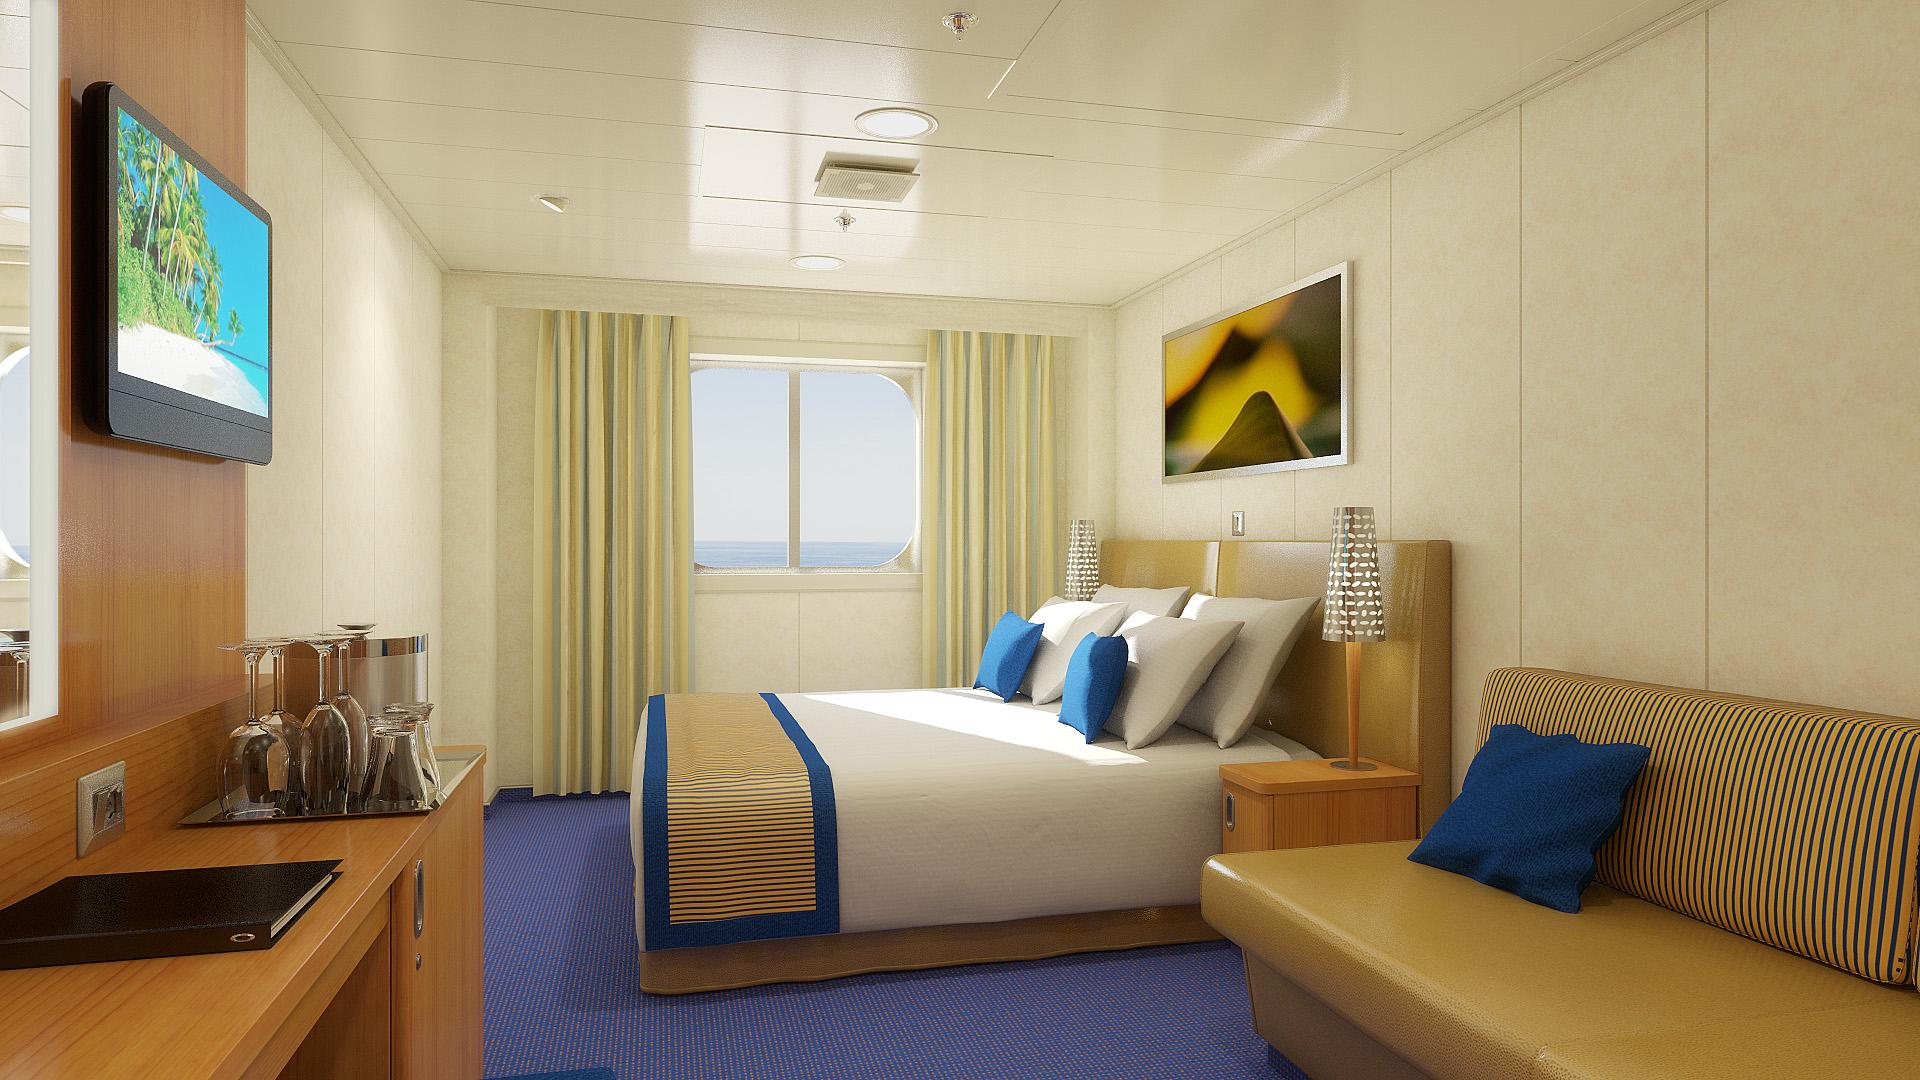 Carnival Cruise Lines Carnival Sunshine Ocean View Digital Rendering 1.jpg